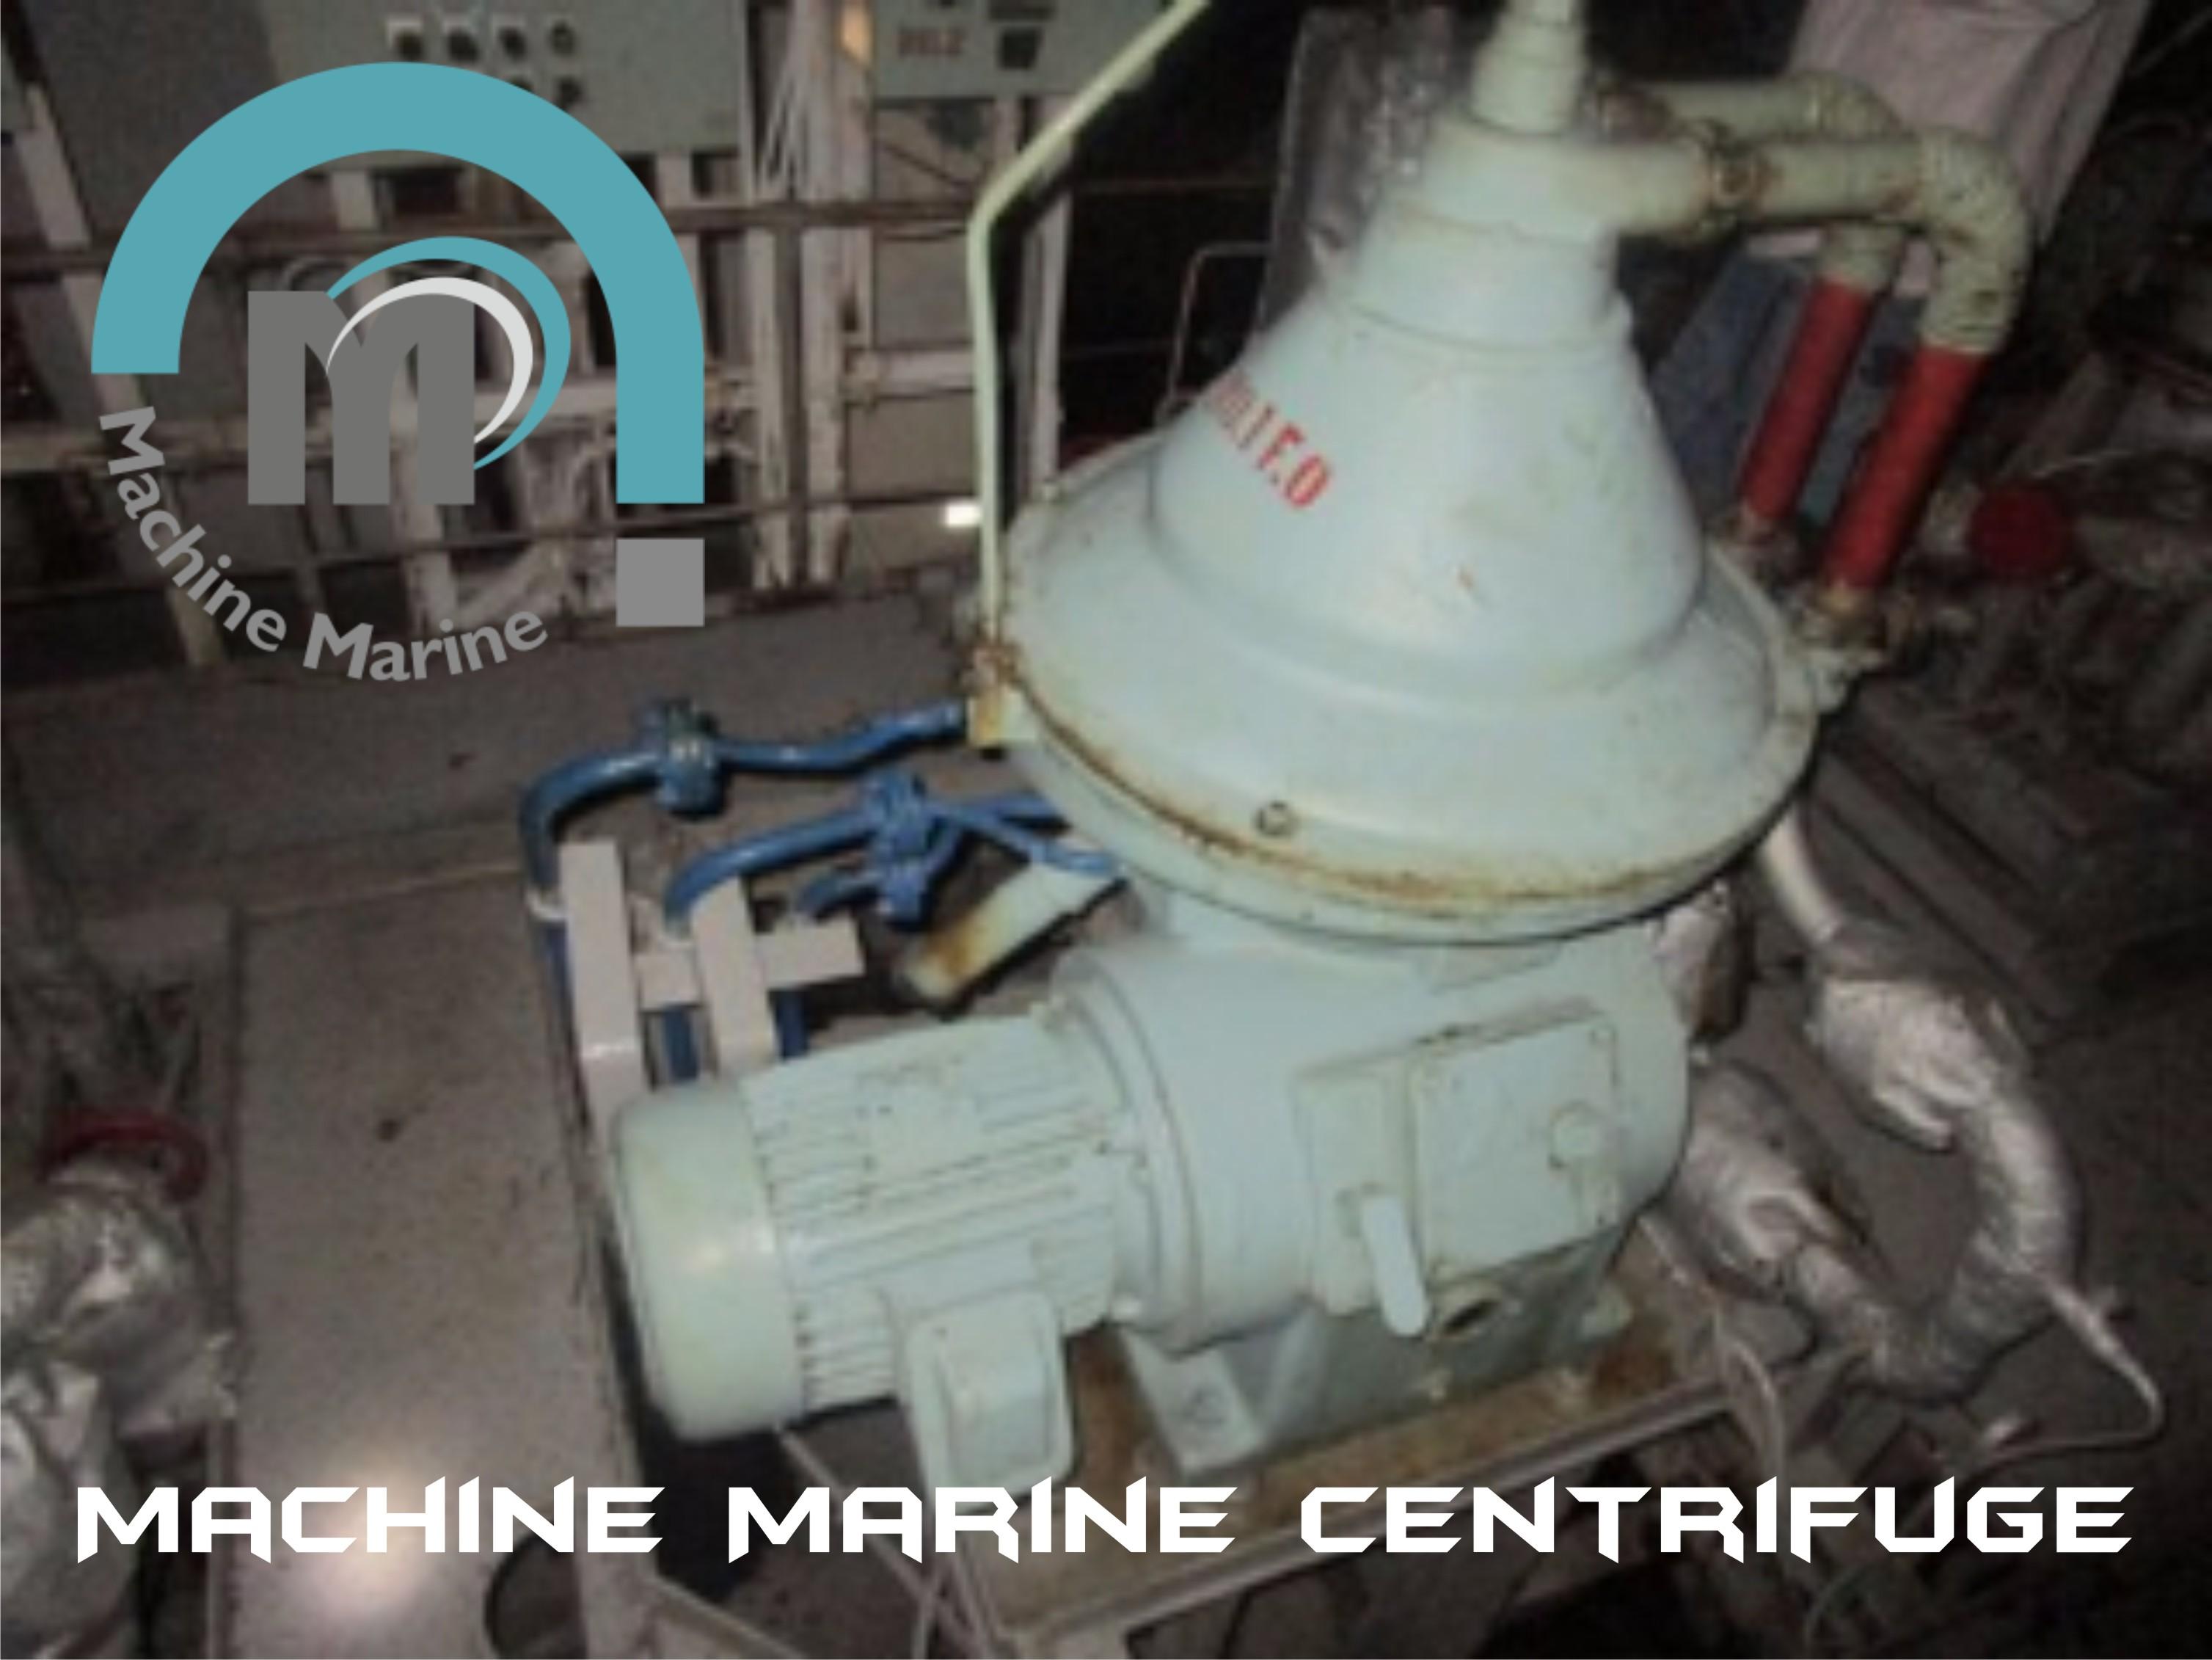 mitsubishi sj 30 oil purifier separator centrifuge alfa laval rh machinemarinecentrifuge com